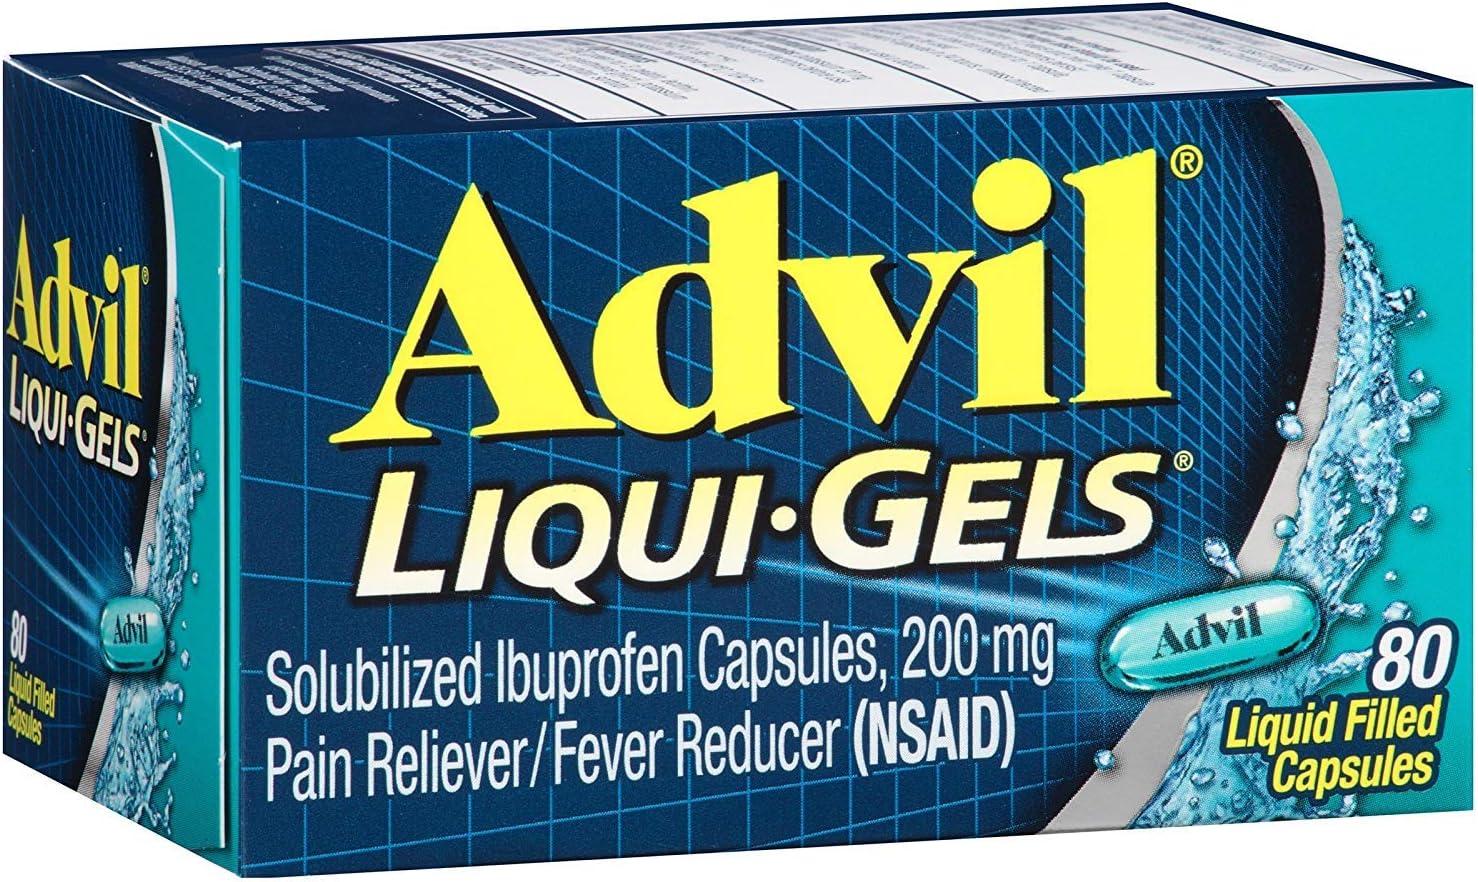 Advil Advanced Medicine for Pain 4 years warranty shopping Ea 80 200mg Liqui-gels